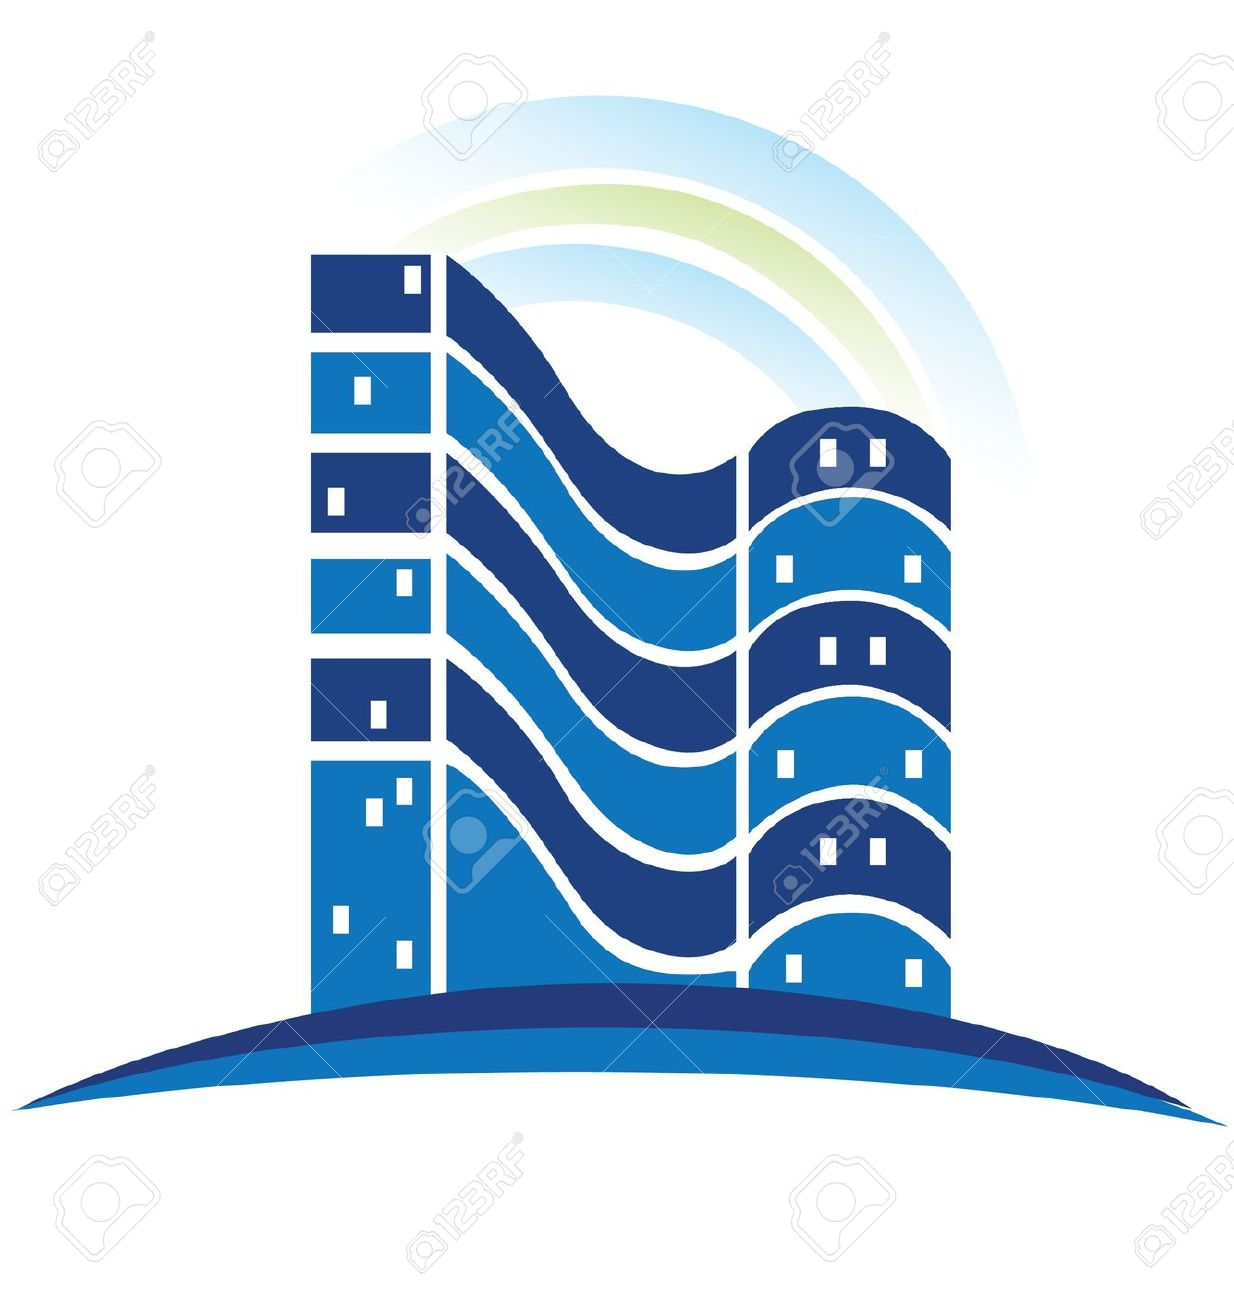 Building logo cliparts